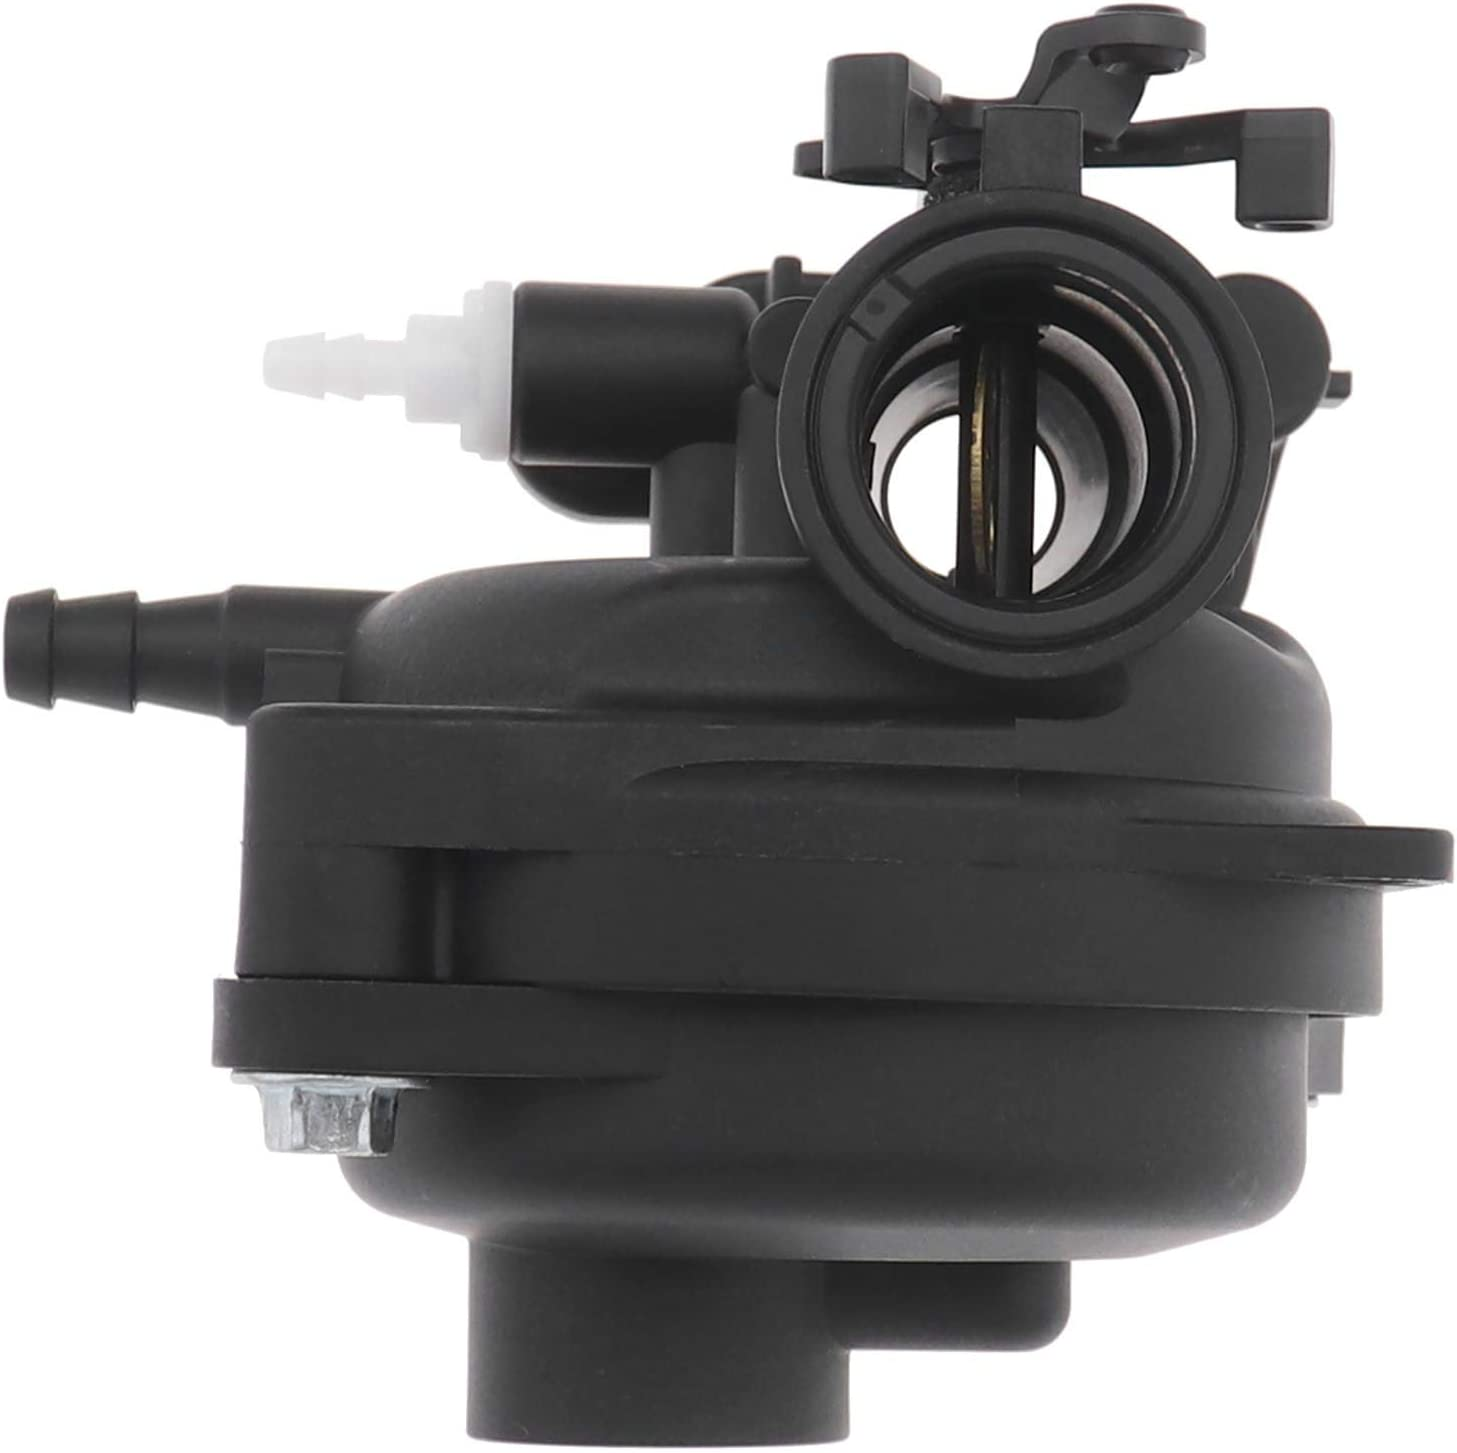 Rasenm/äher Motor Vergaser kompatibel mit Briggs /& Stratton 300E 450E OVH Motoren 591979 595656 590556